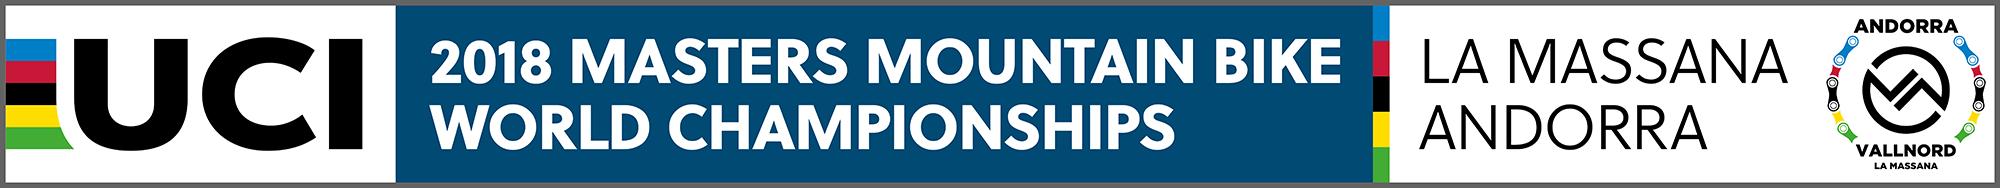 2018_UCI_MTB_Masters_WCh_Andorra_La-Massana_CMYK_Keyline_low